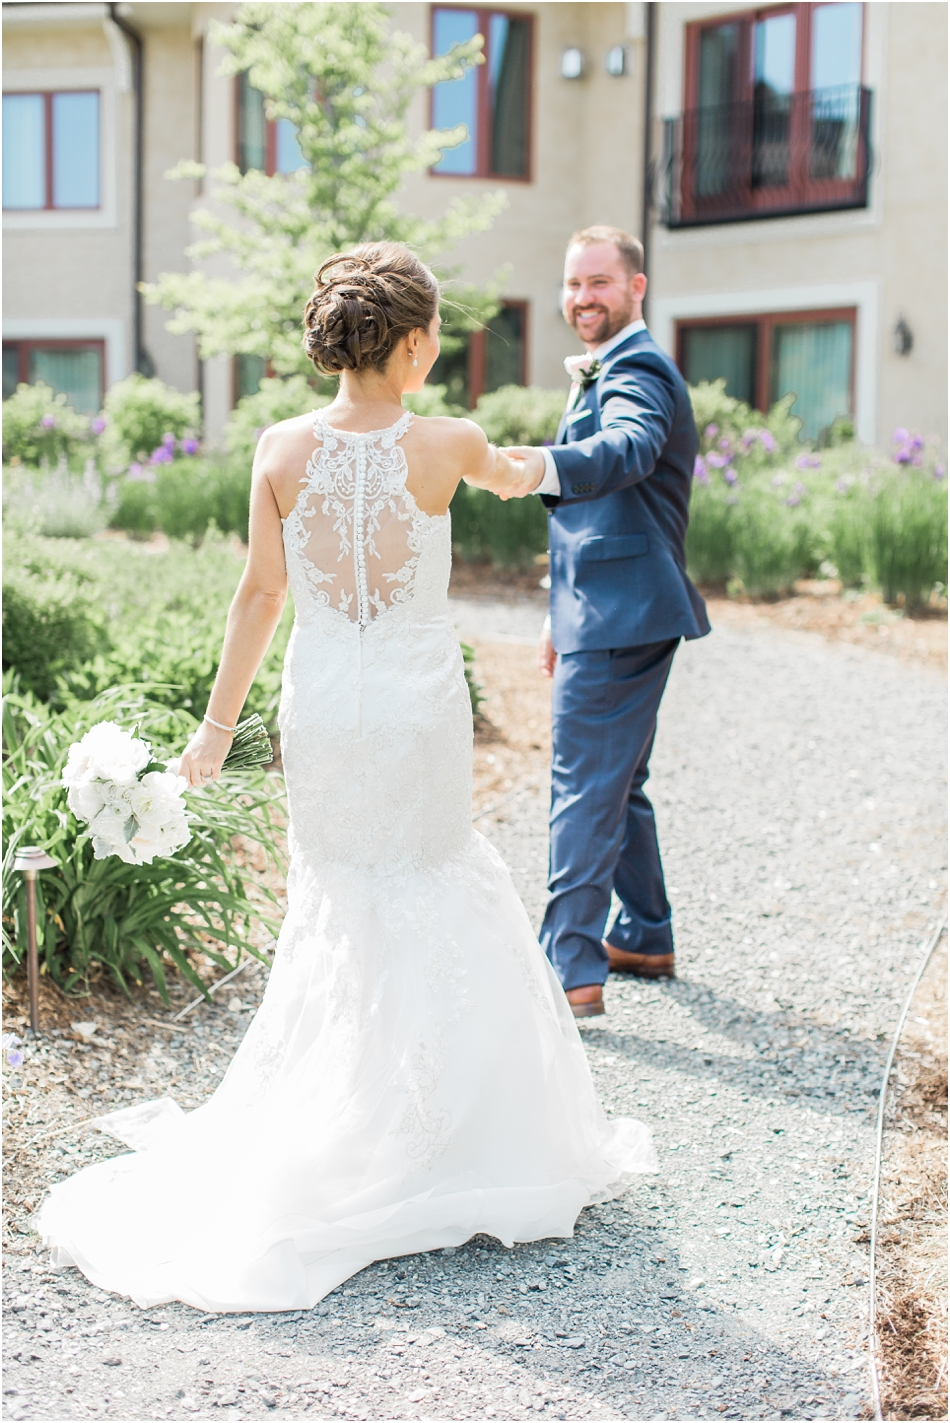 pine_hills_mirbeau_golf_club_boston_massachusetts_cape_cod_new_england_wedding_photographer_Meredith_Jane_Photography_photo_1695.jpg